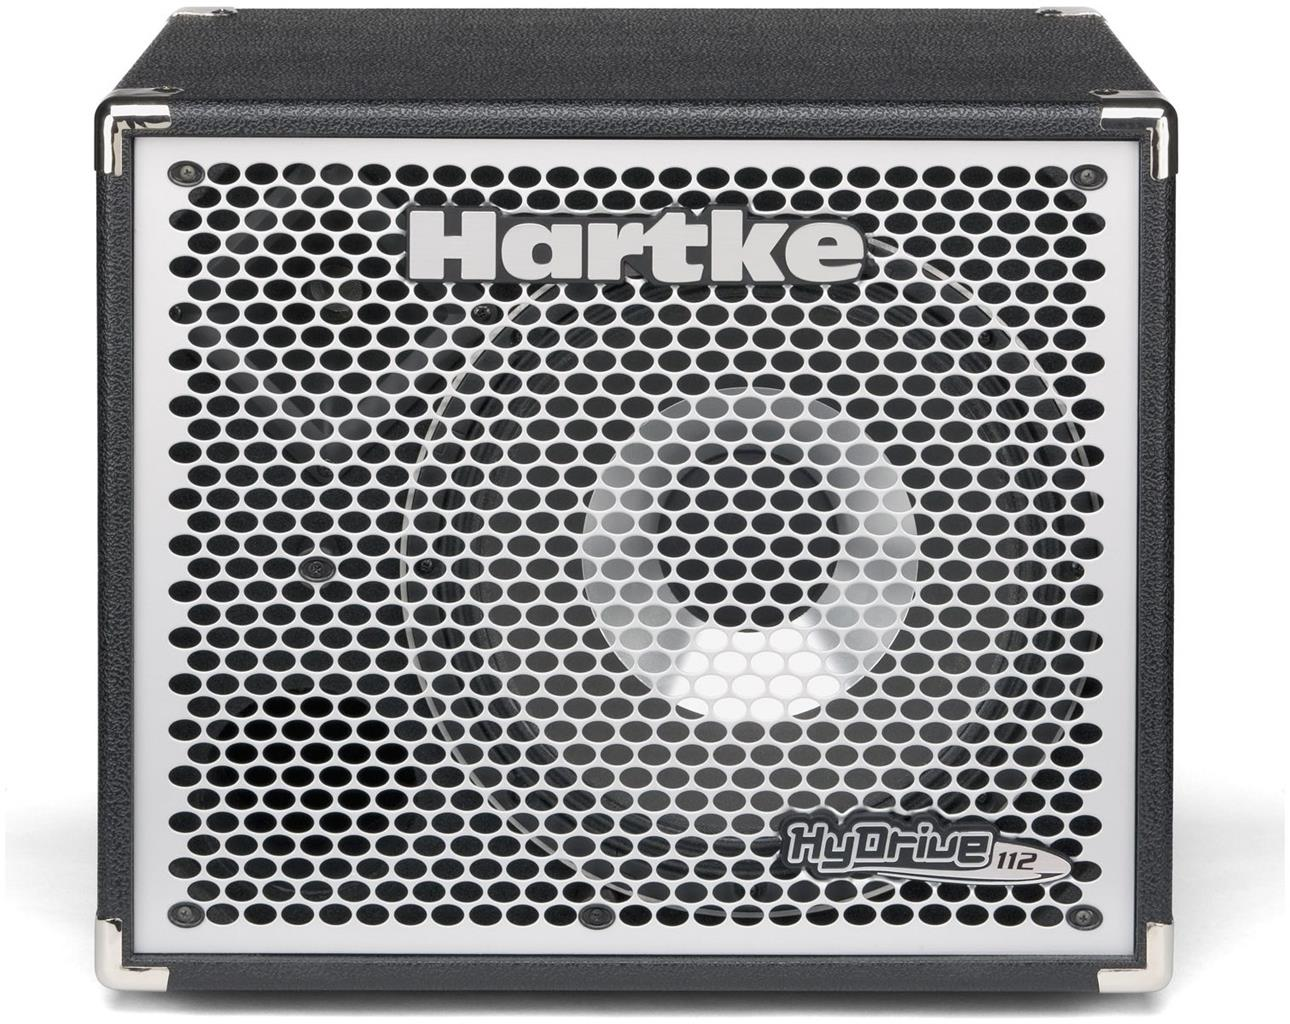 HARTKE-HX-112-HYDRIVE-1X12-sku-23761